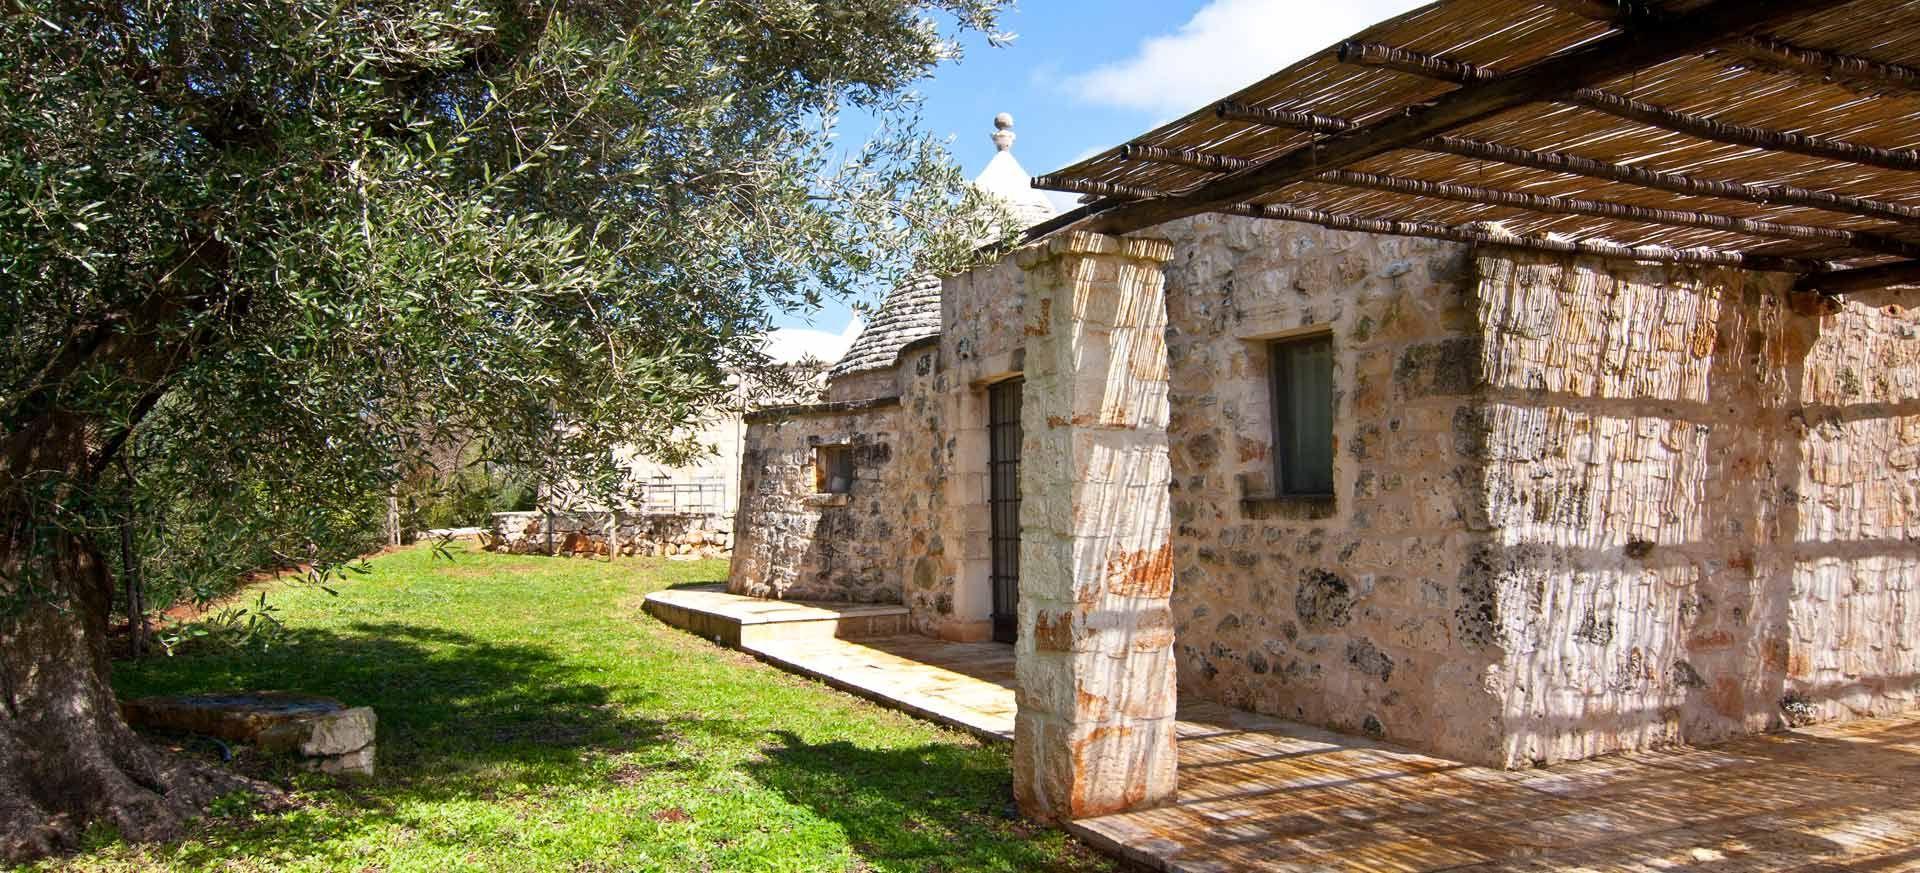 Location Trulli Pouilles Chambre D Hote Cisternino Hote Italia Pouilles Voyage Et Tourisme Hotes